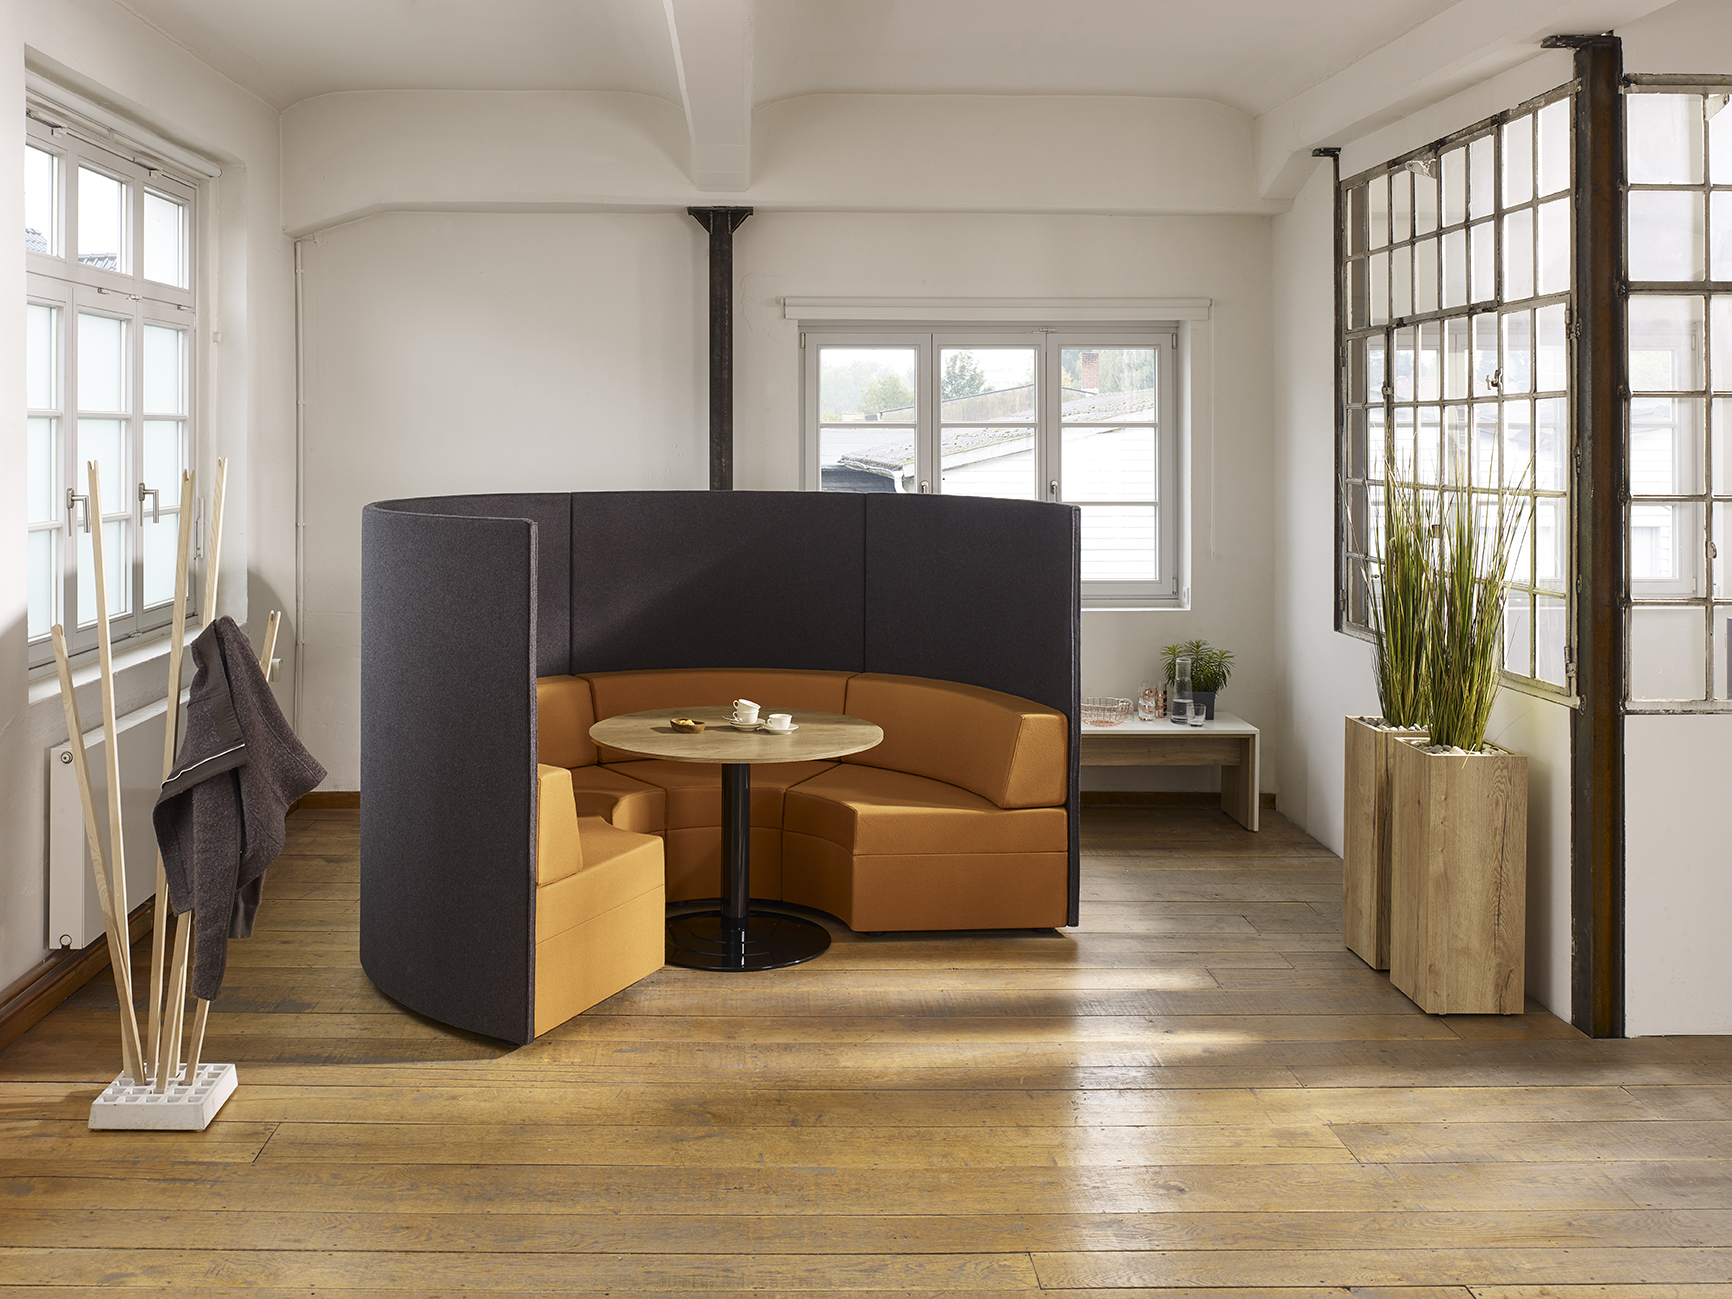 febr sonderposten gwv b rom bel. Black Bedroom Furniture Sets. Home Design Ideas